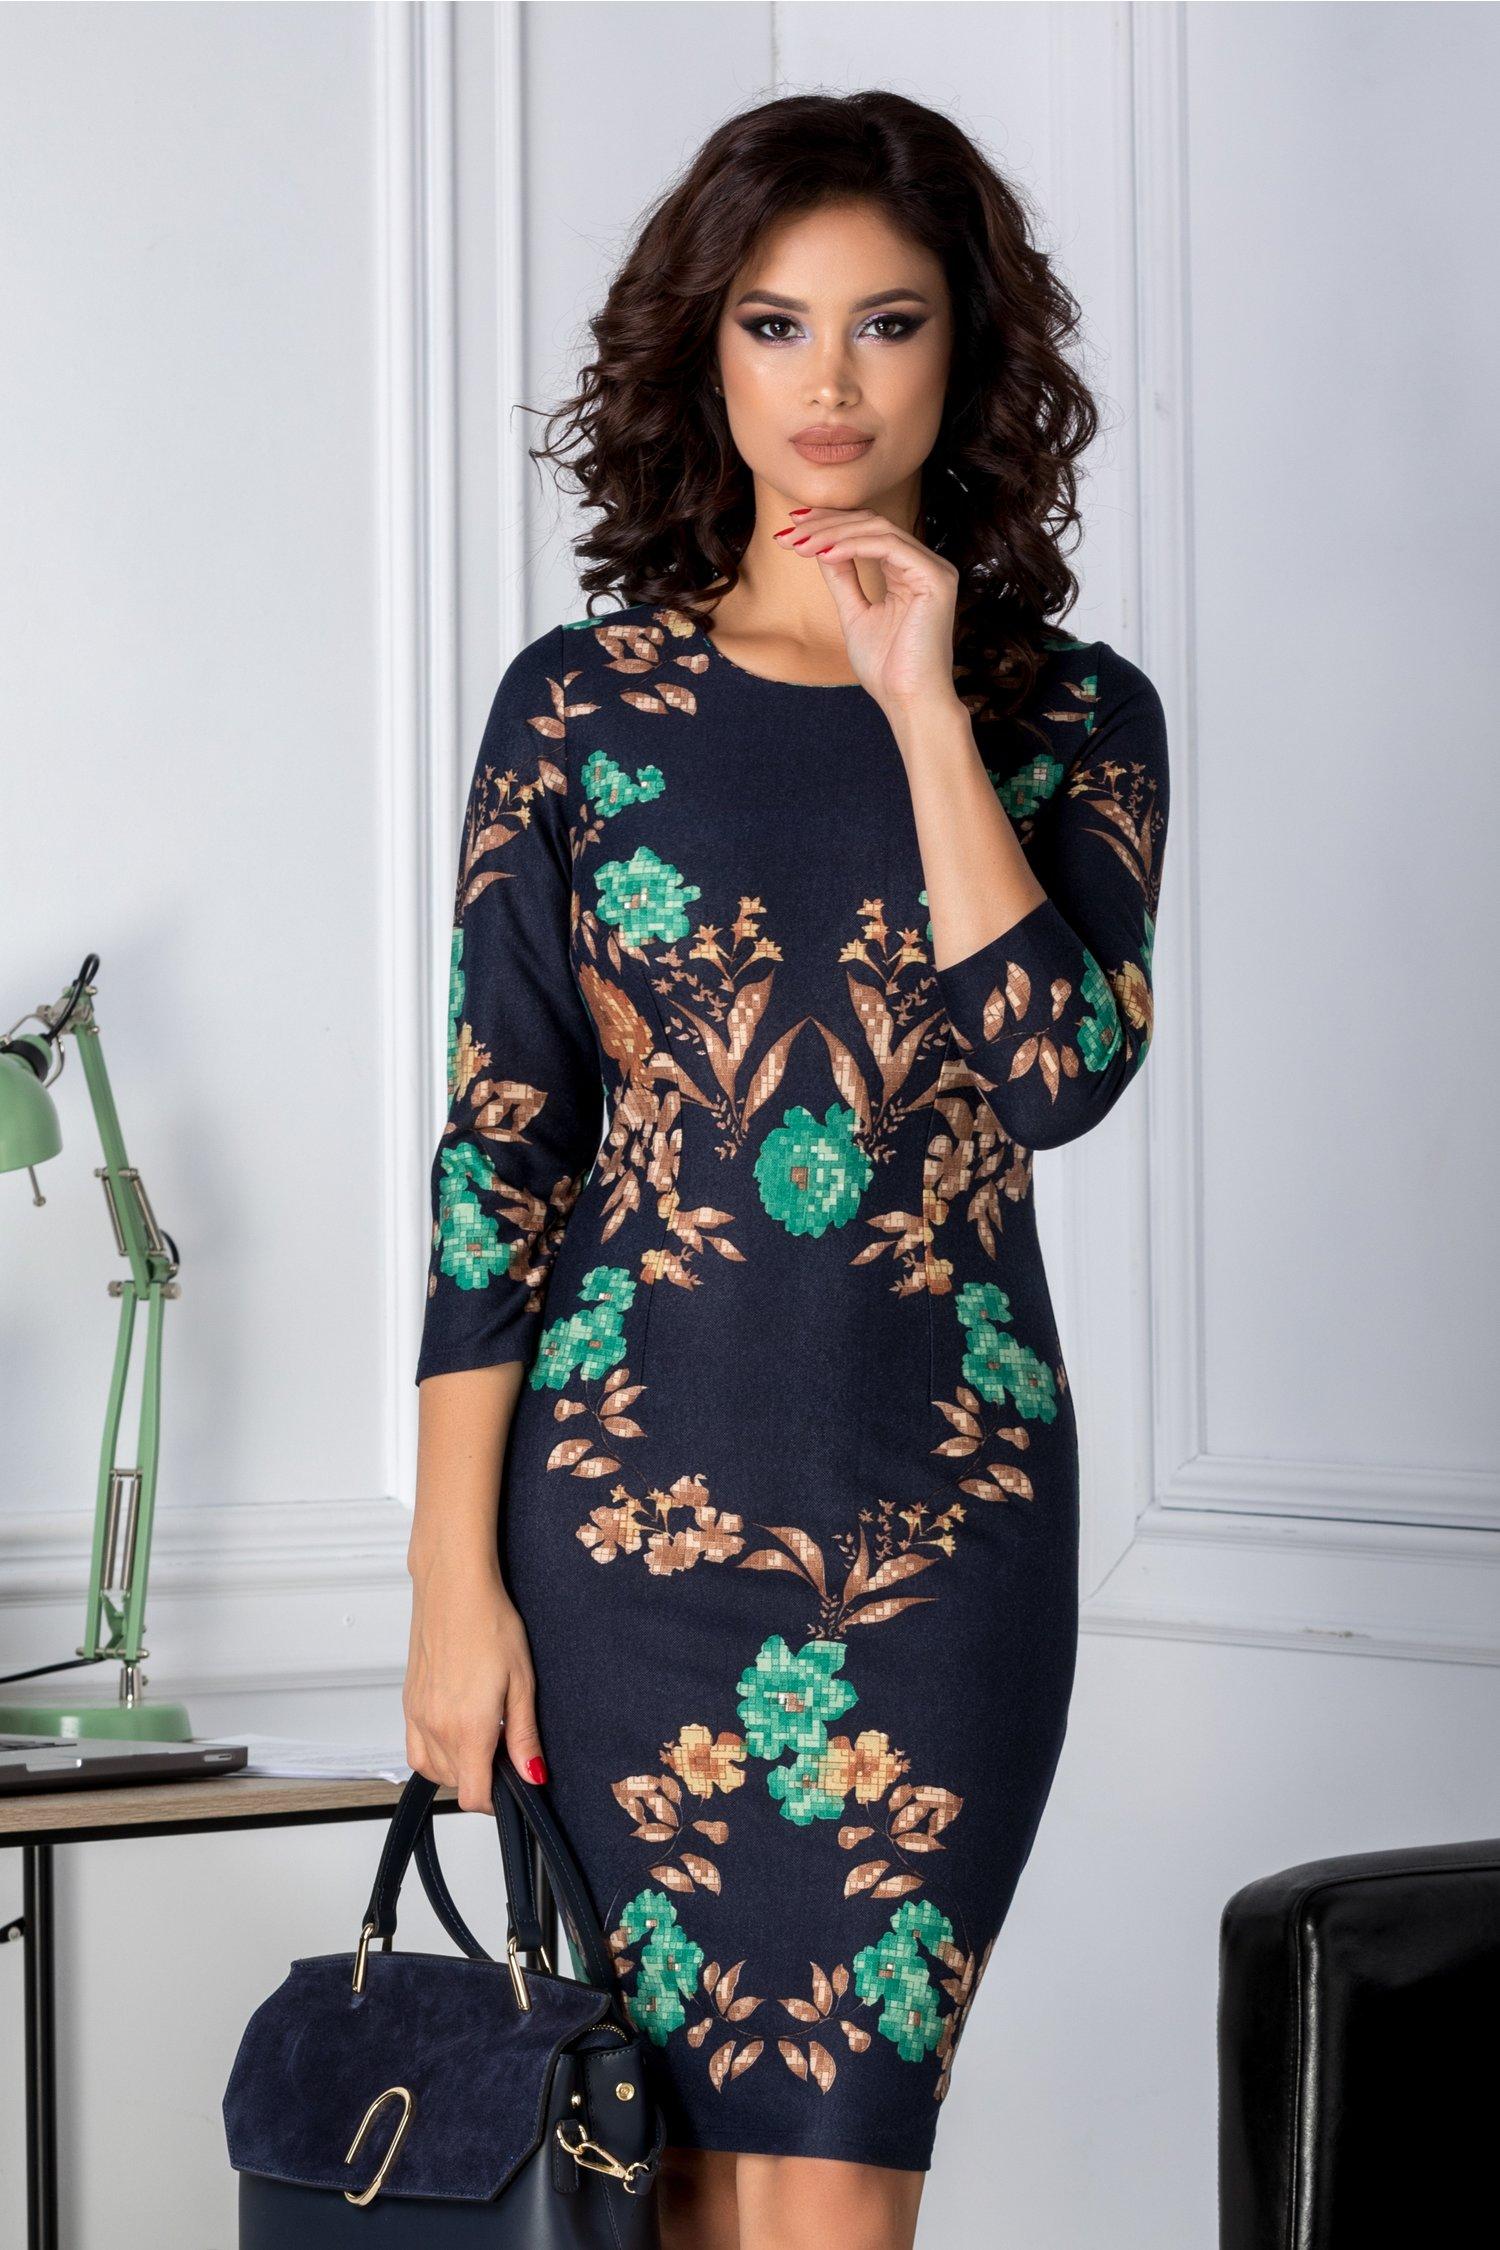 Rochie Arysa bleumarin cu imprimeu floral maro verde